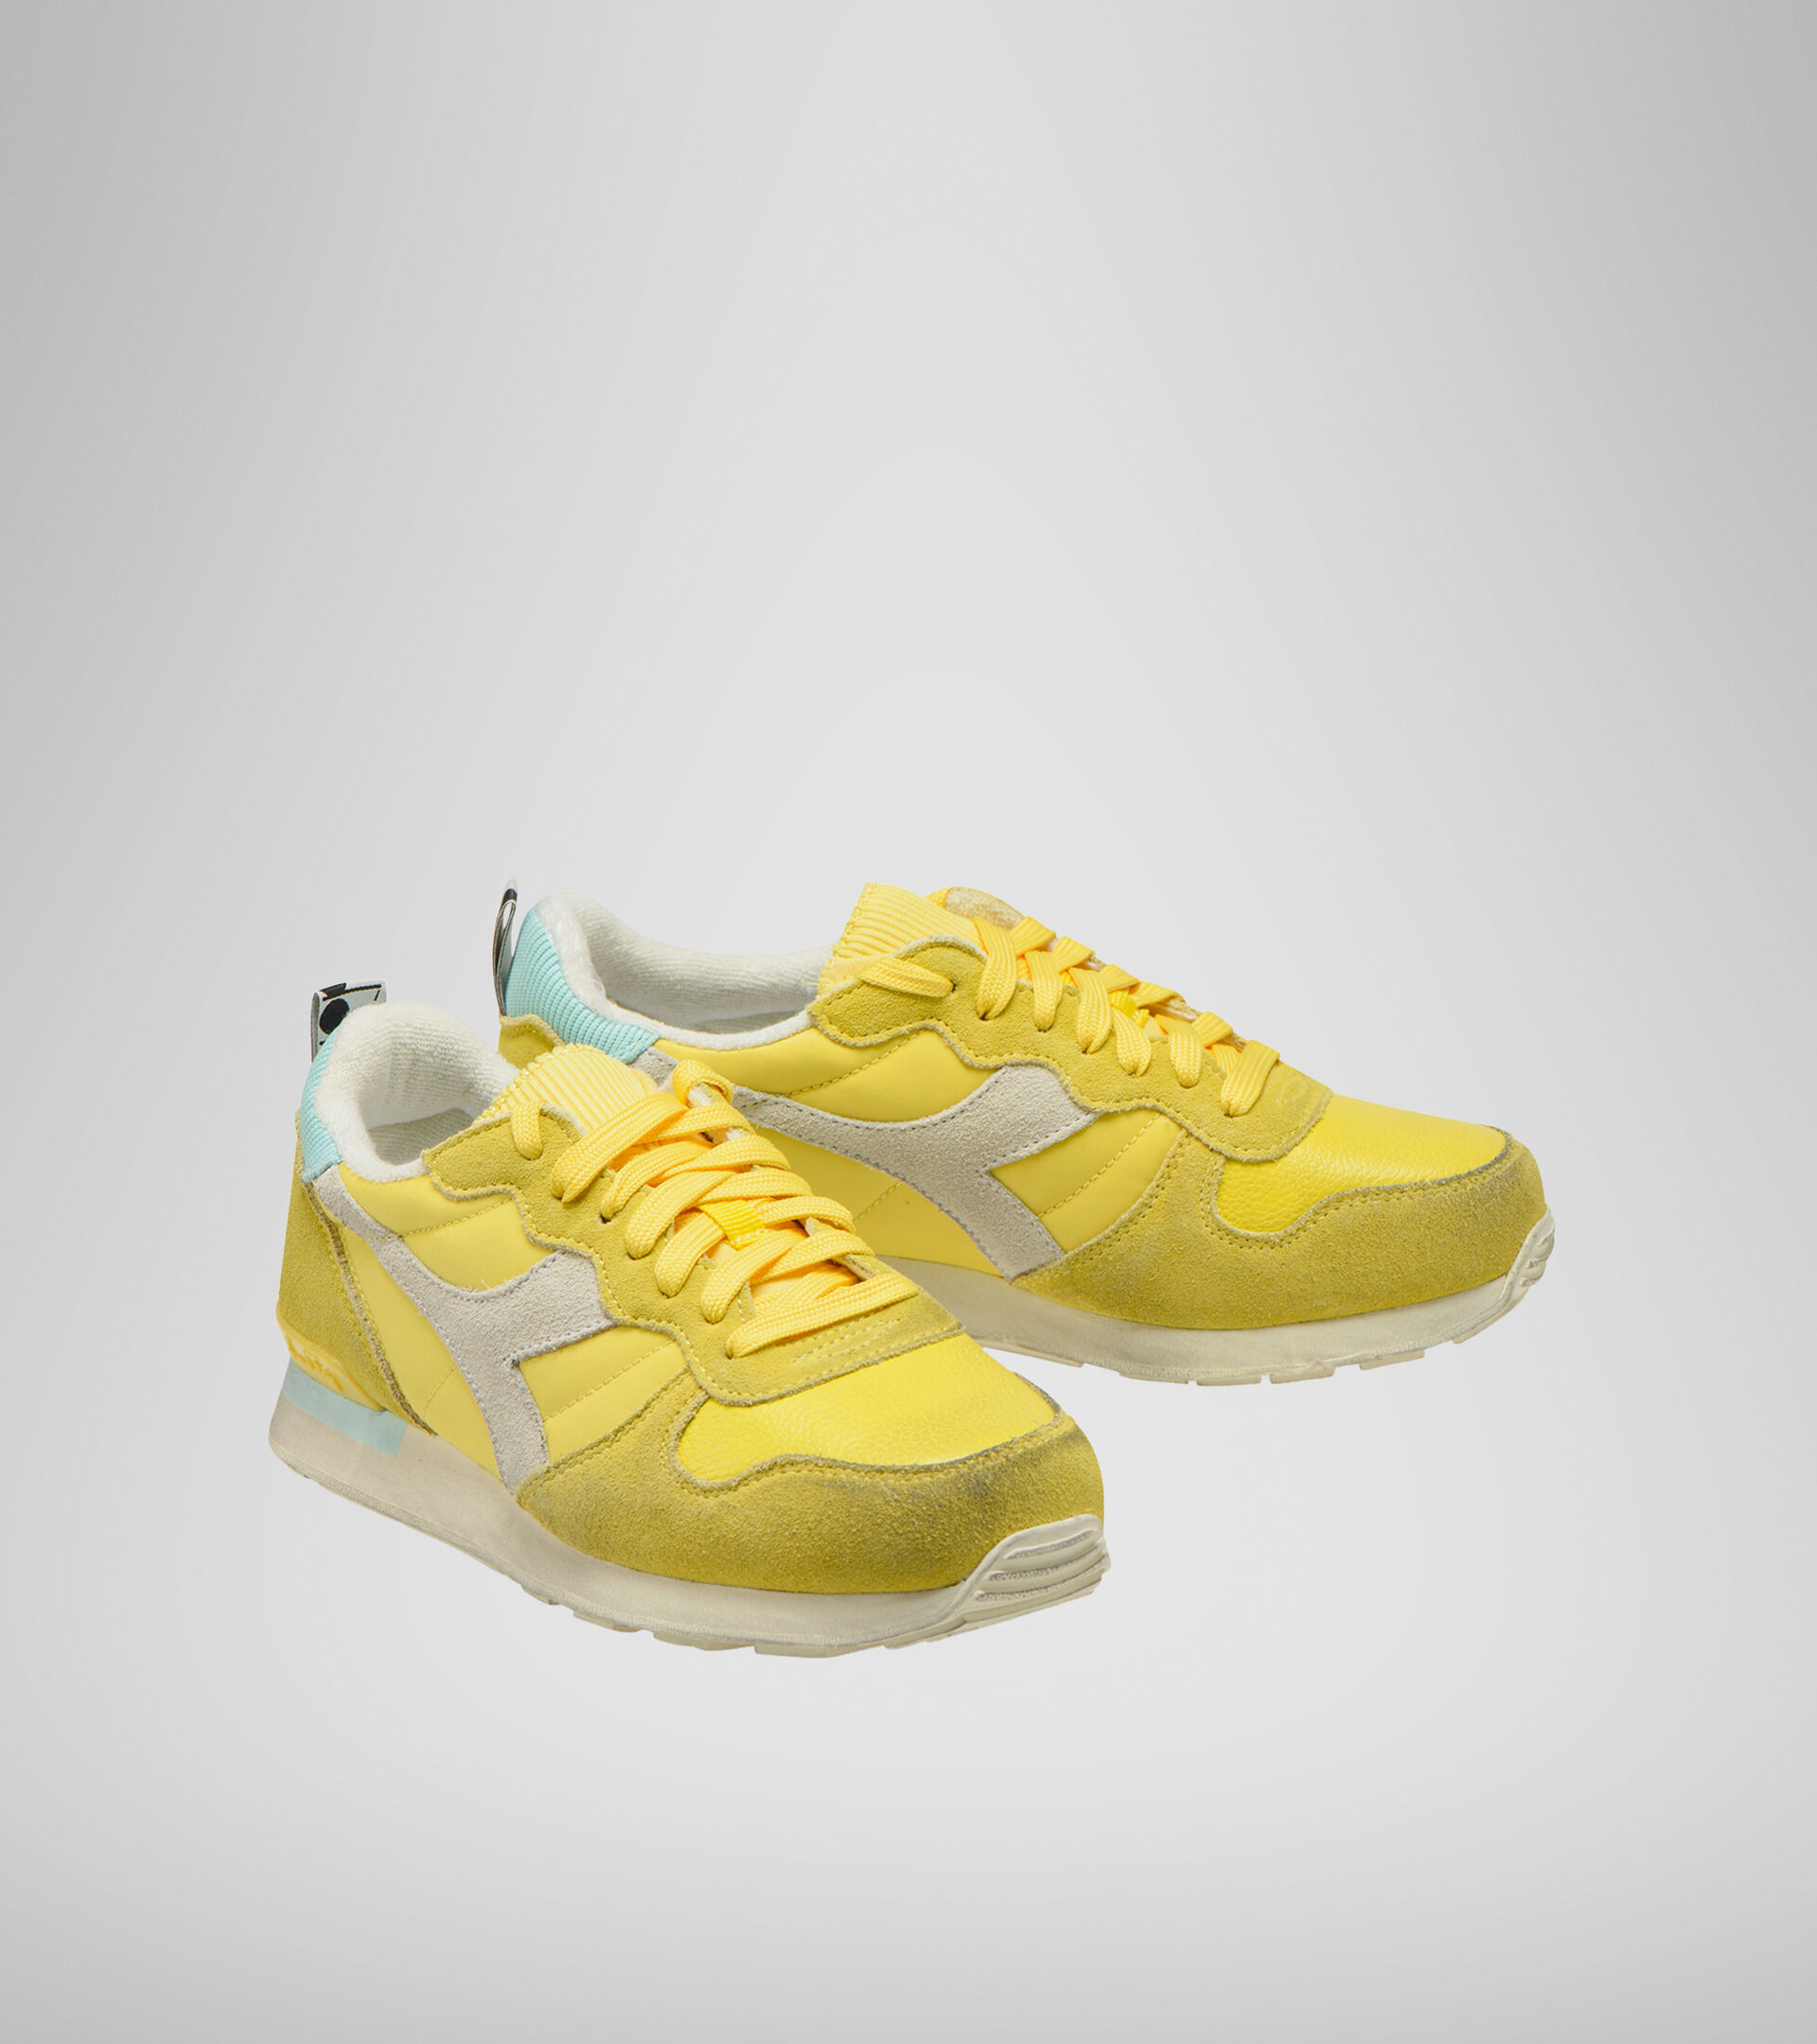 Footwear Sportswear DONNA CAMARO ICONA WN JILGUERO YANQUI/AZUL TINTE Diadora